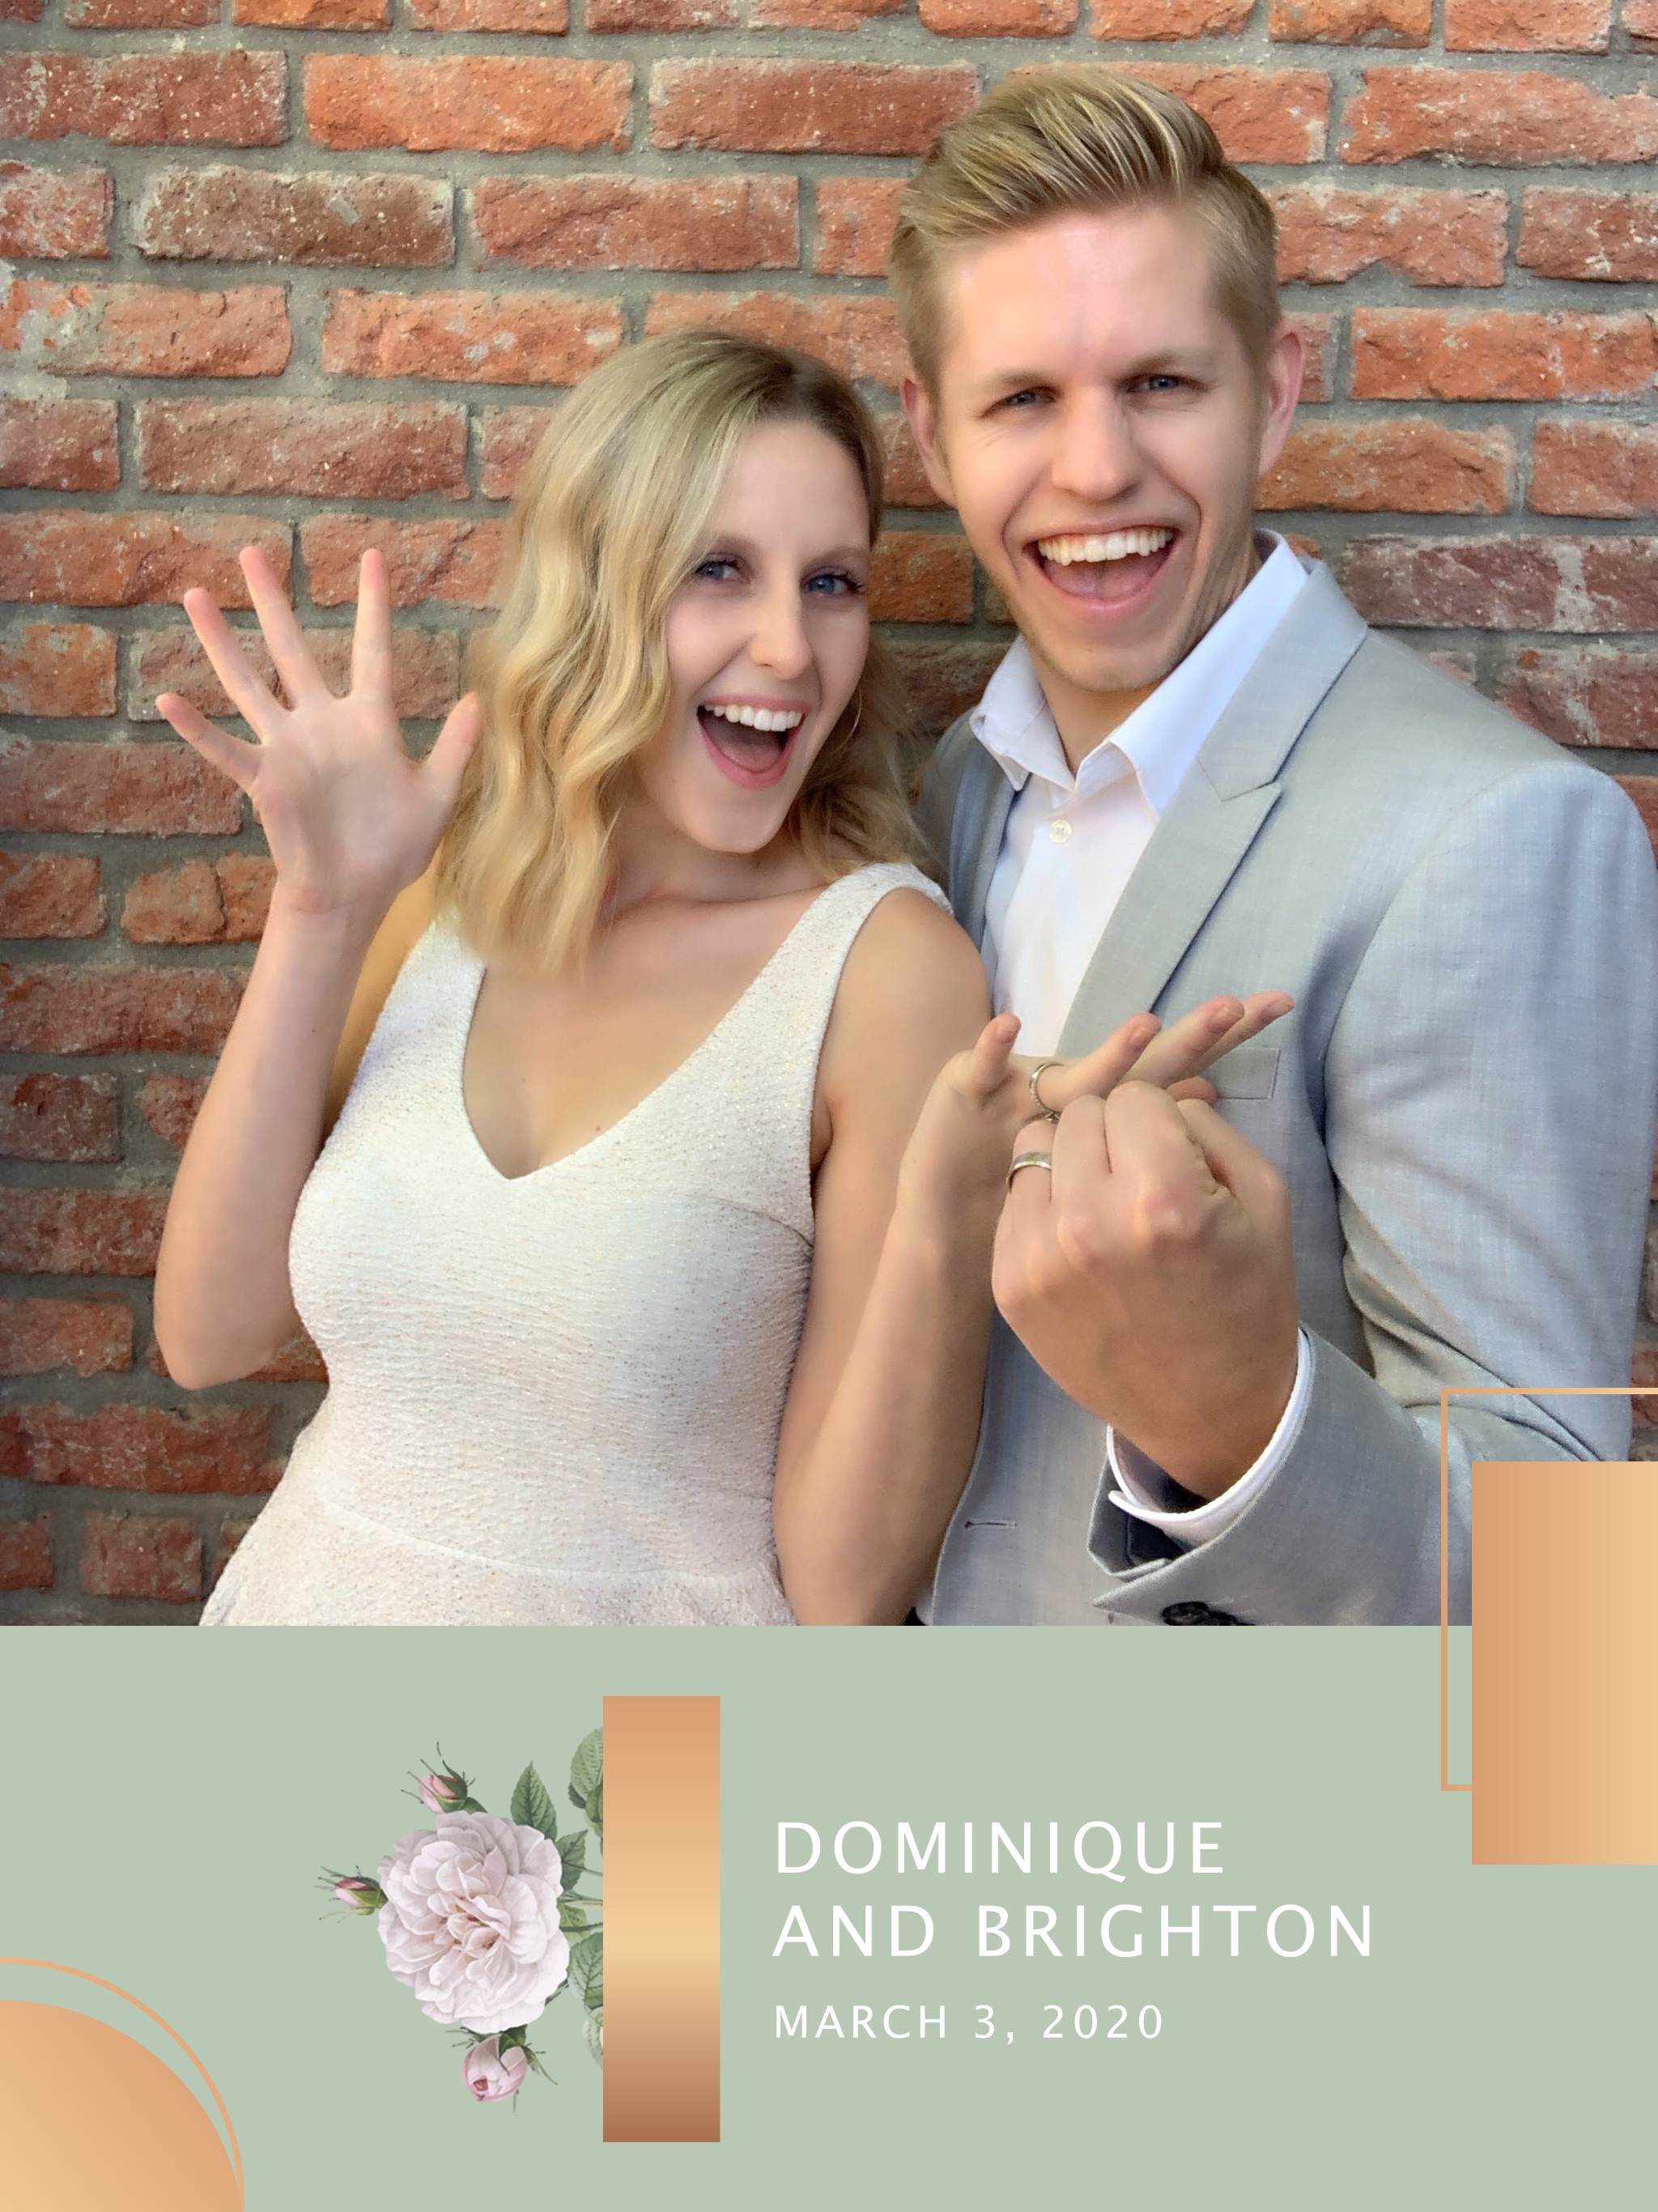 wedding digital overlay 1 1